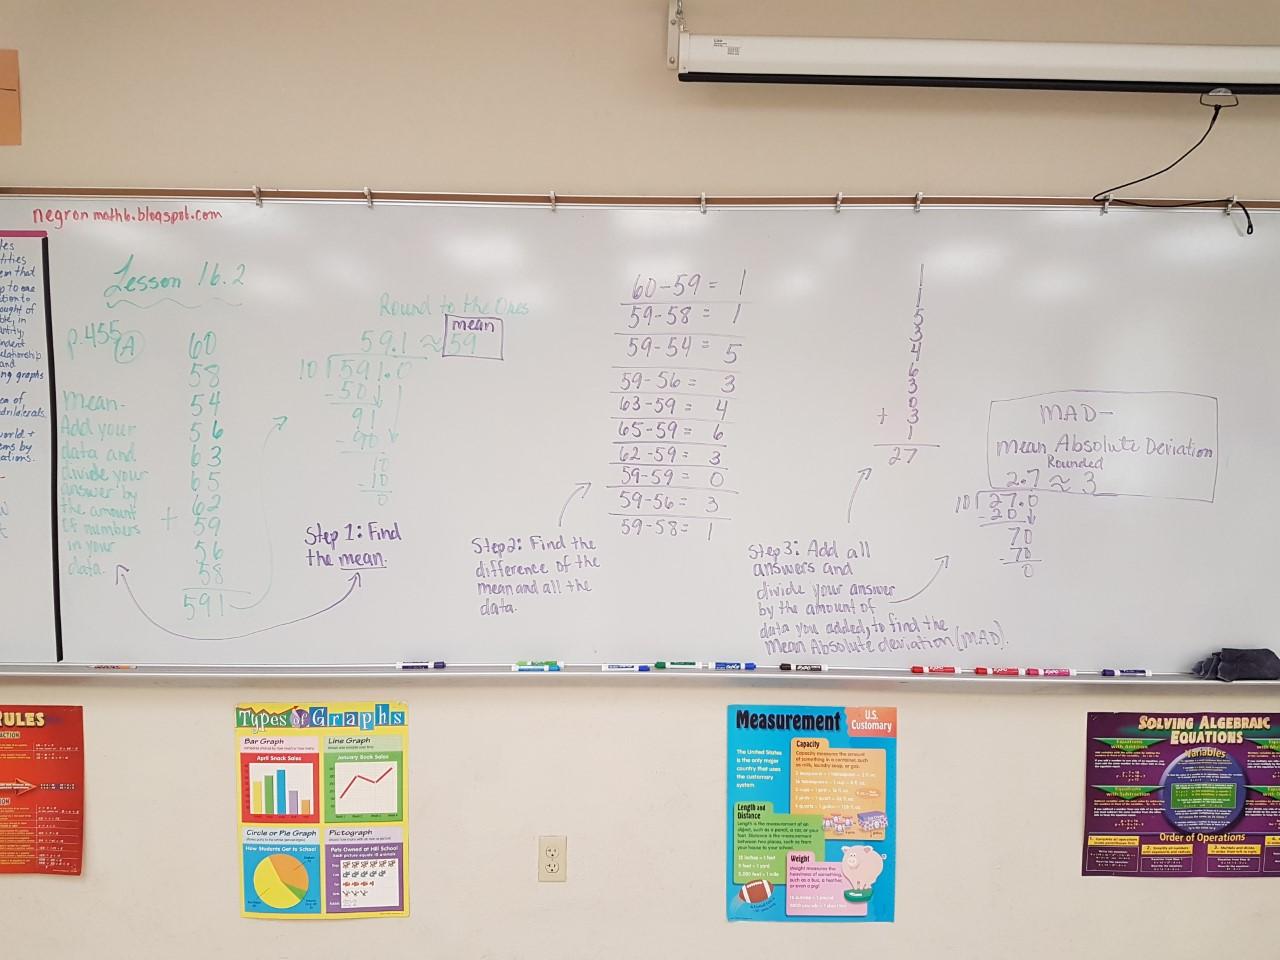 Mrs Negron 6th Grade Math Class Lesson 16 2 Mean